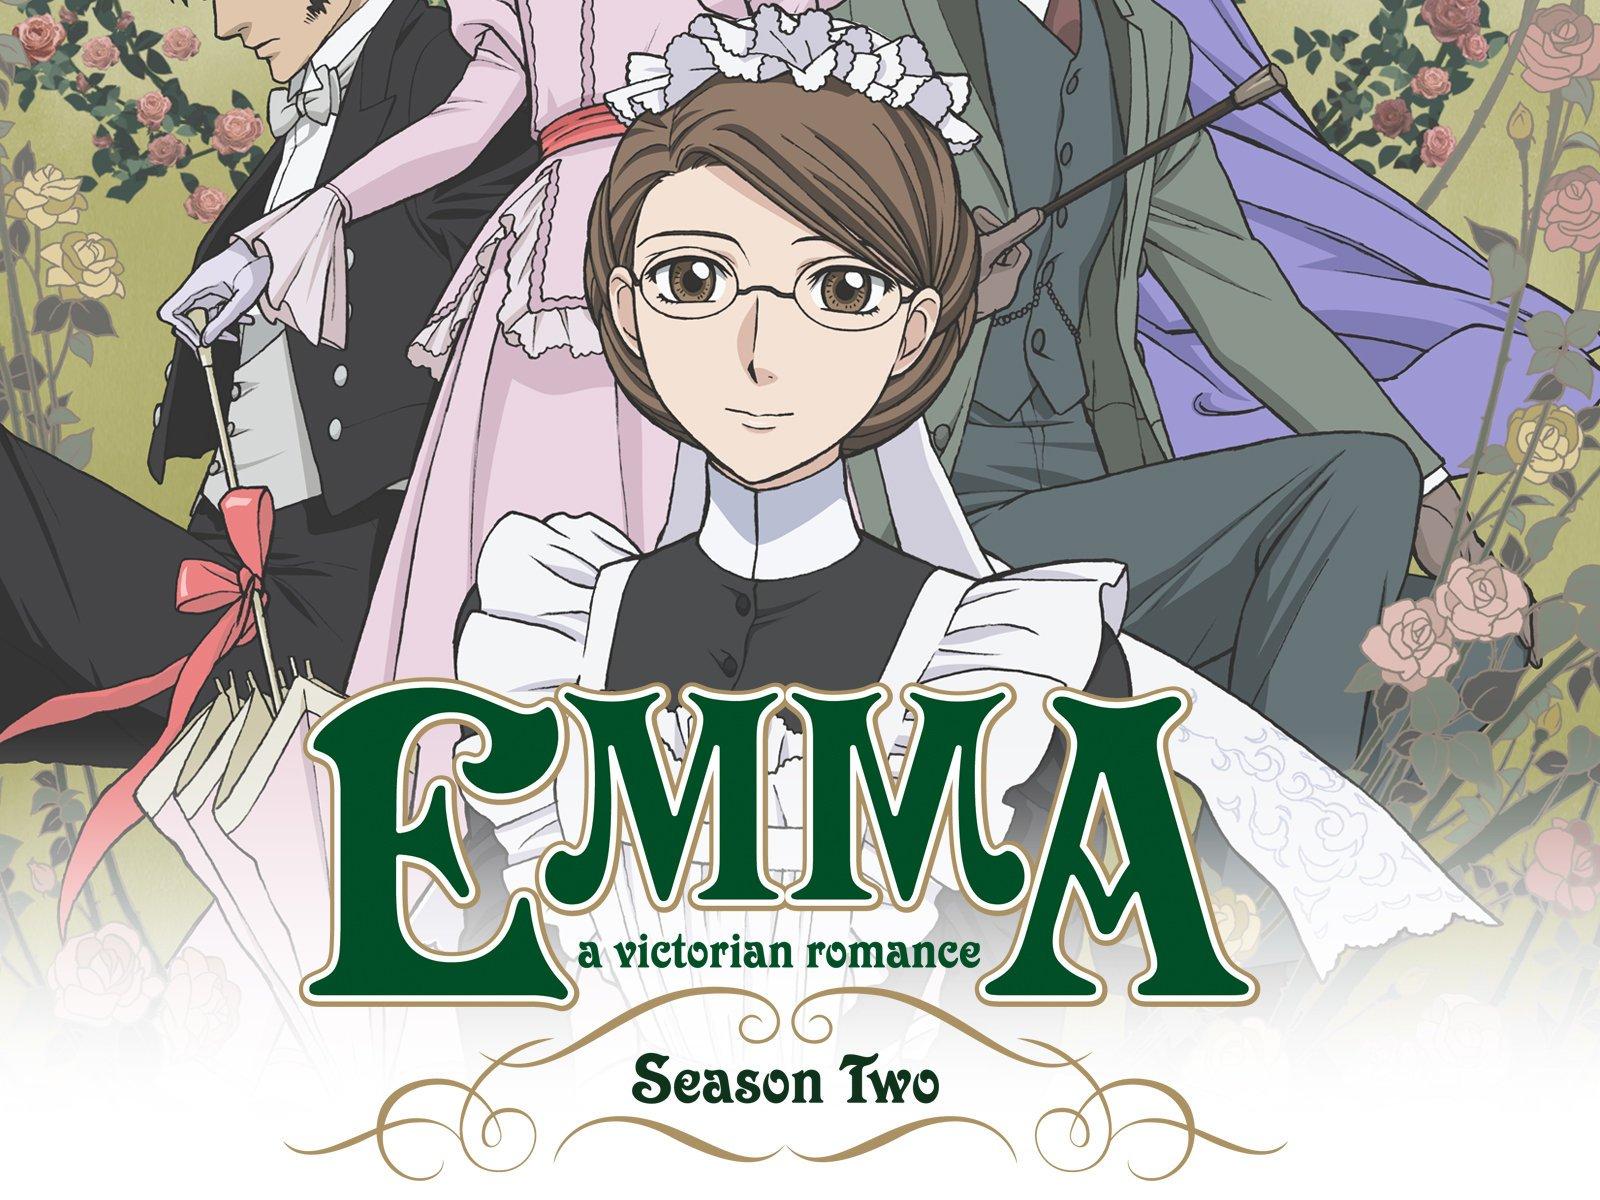 Victorian Romance Emma Ss2 - VietSub (2014)